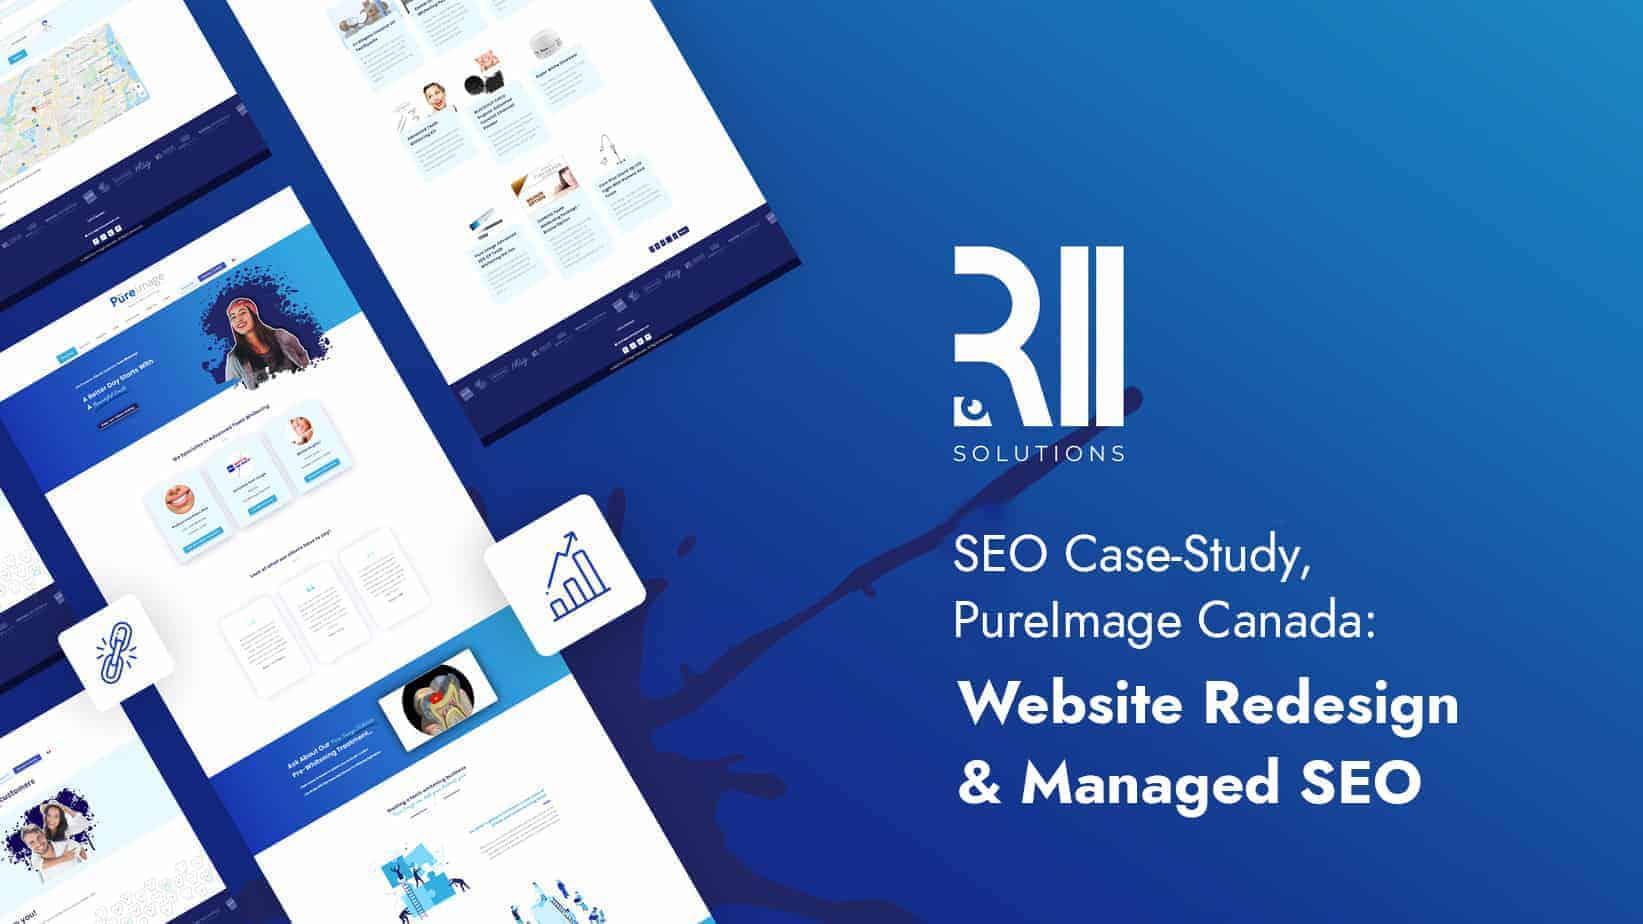 SEO Case-Study, PureImage Canada: Website Redesign & Managed SEO